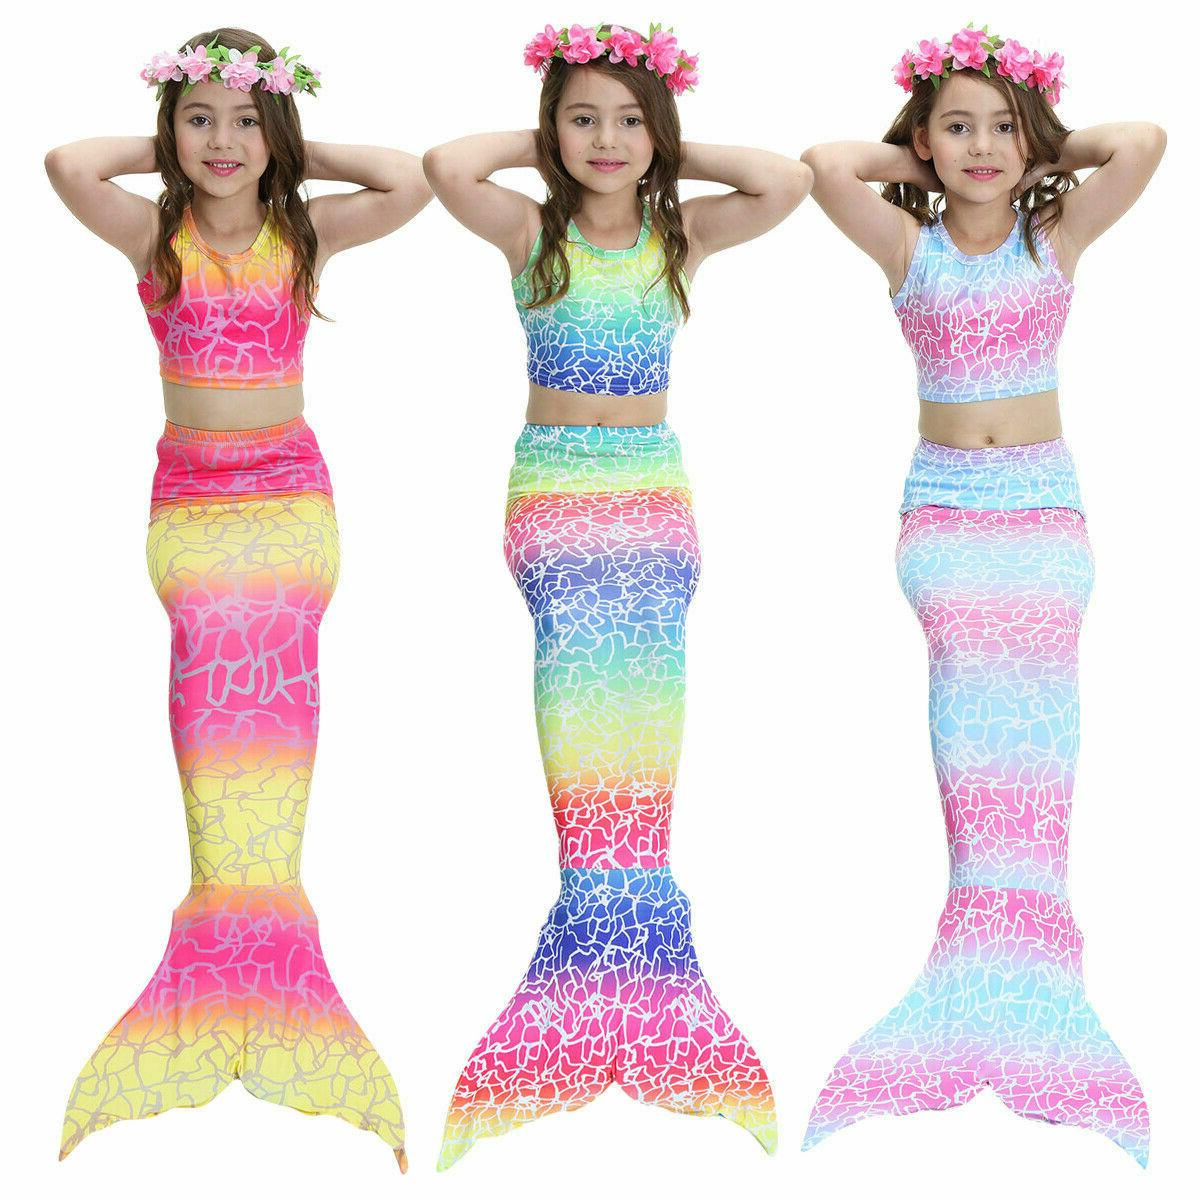 us kids girl mermaid tail bikini set